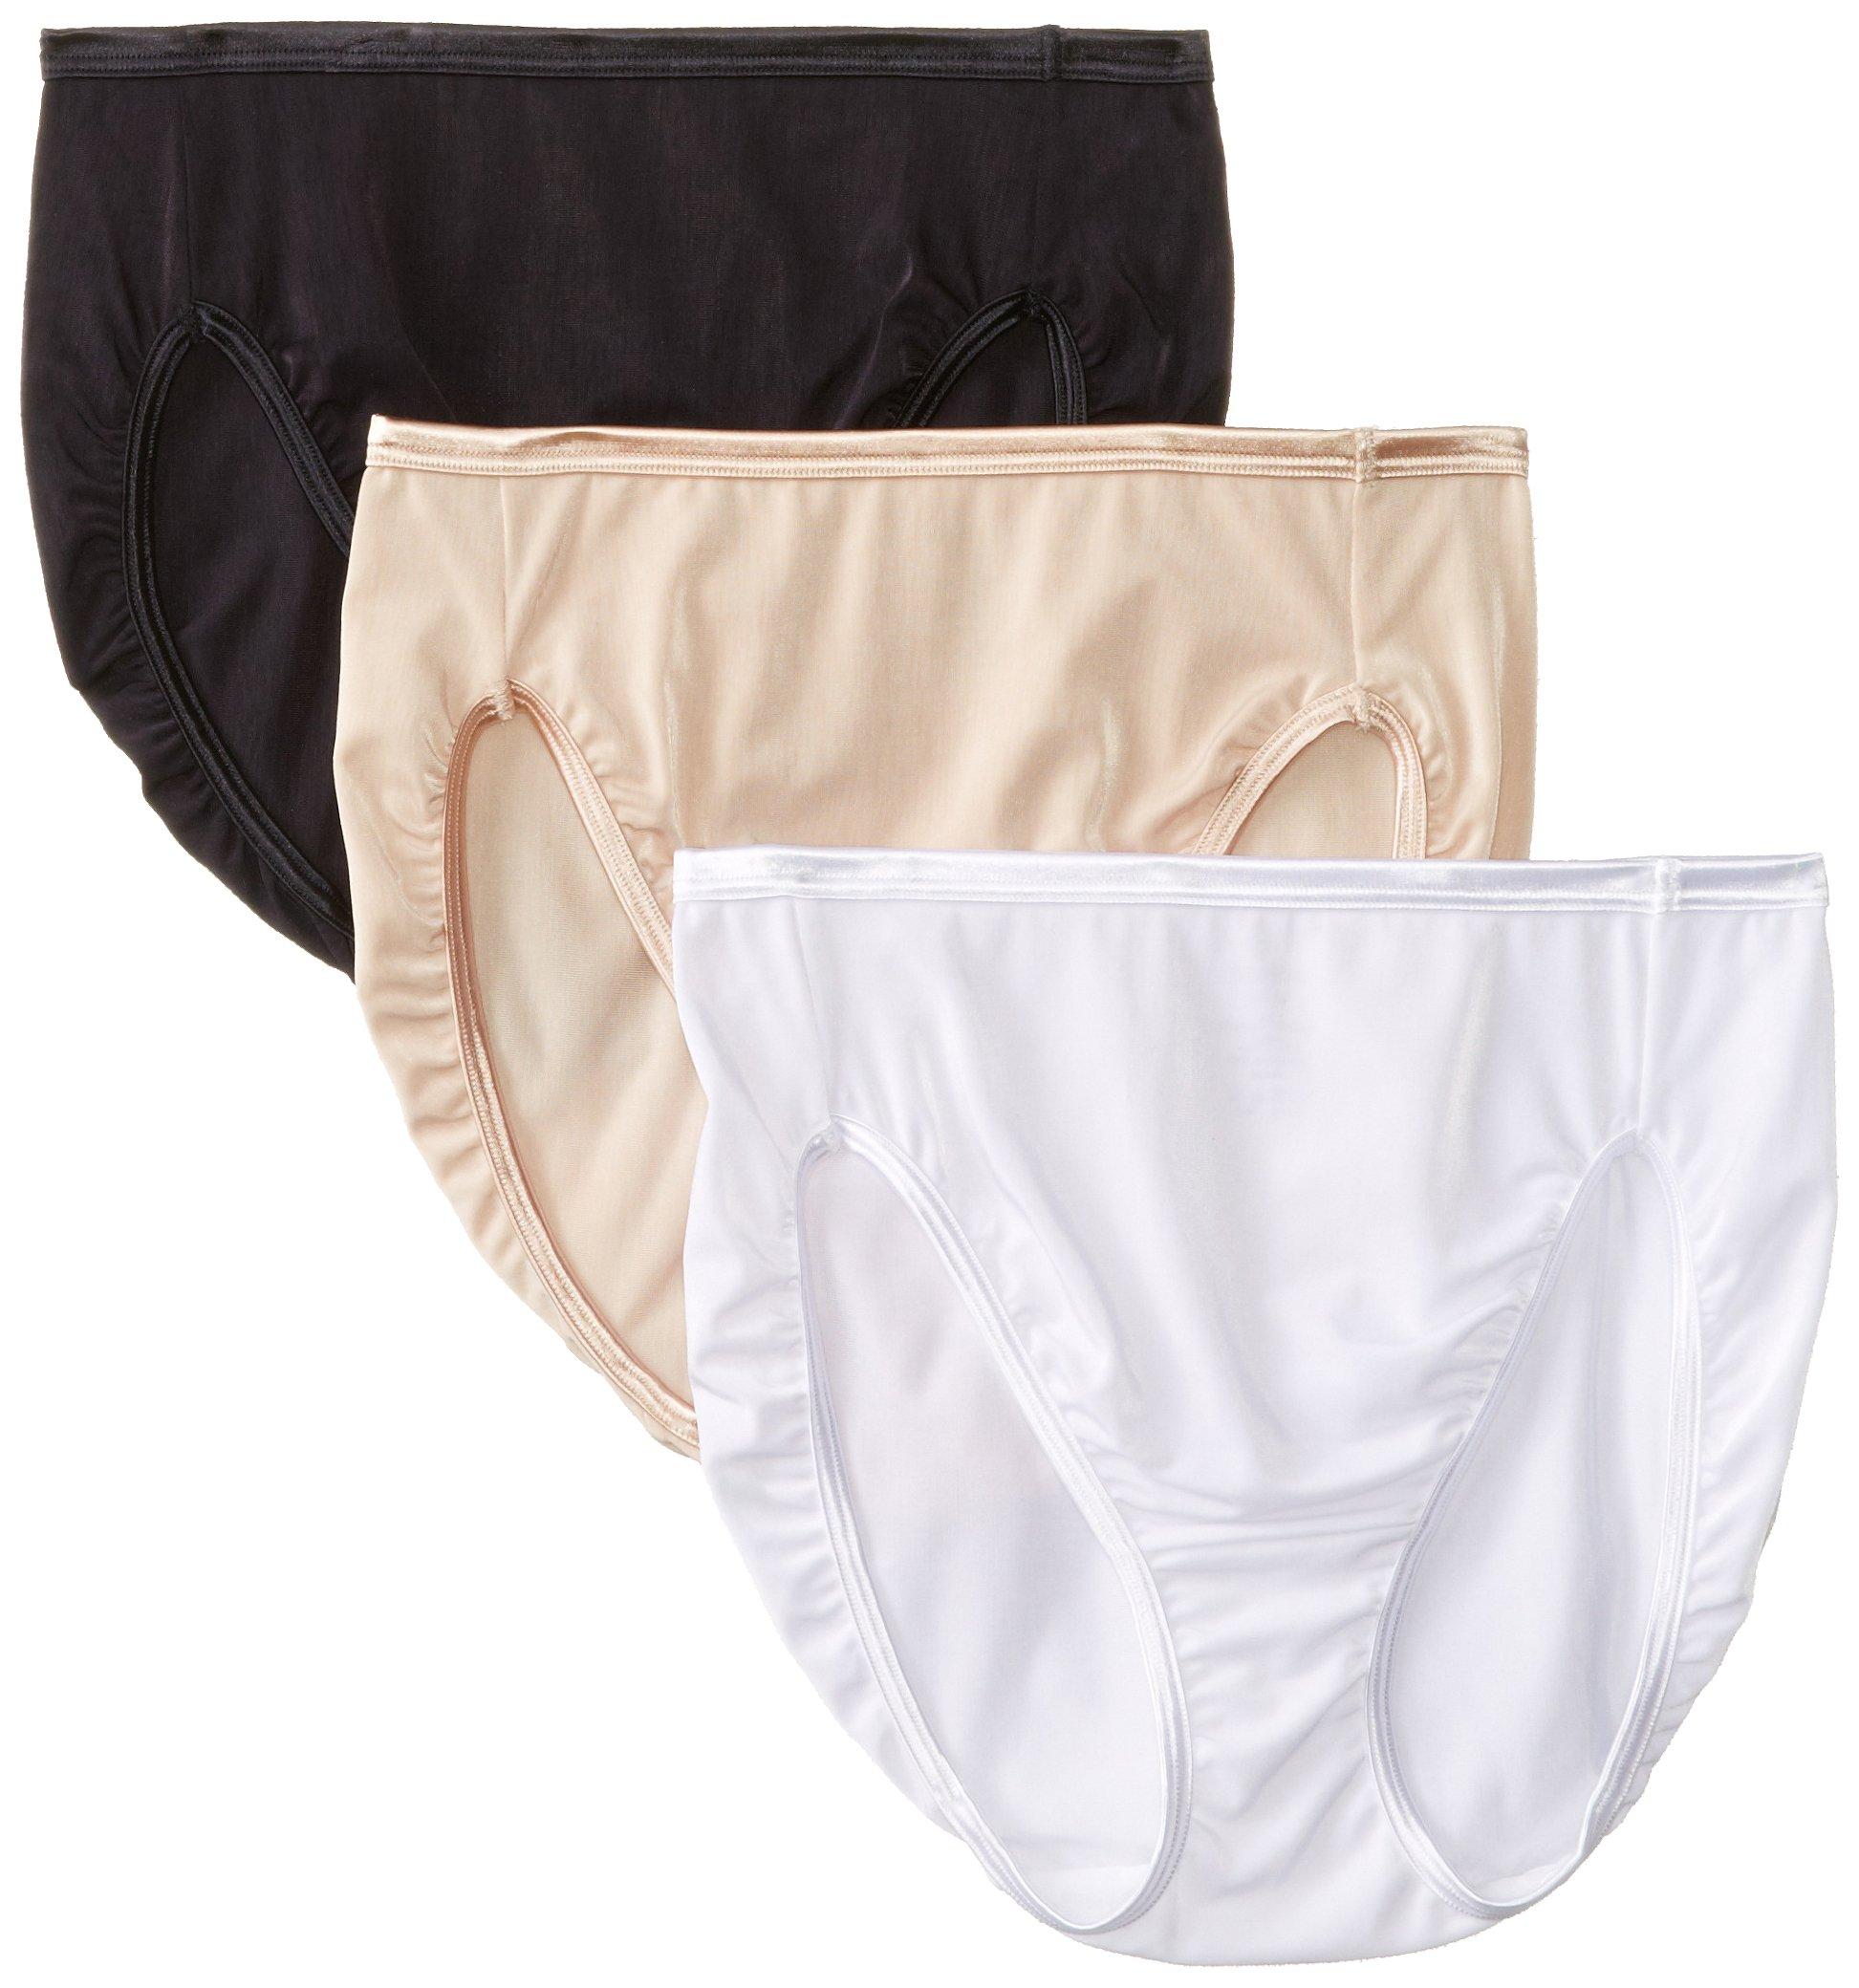 Vanity Fair Women's 3 Pack Illumination Hi Cut Panty 13308, White/Rose Beige/Black, 8